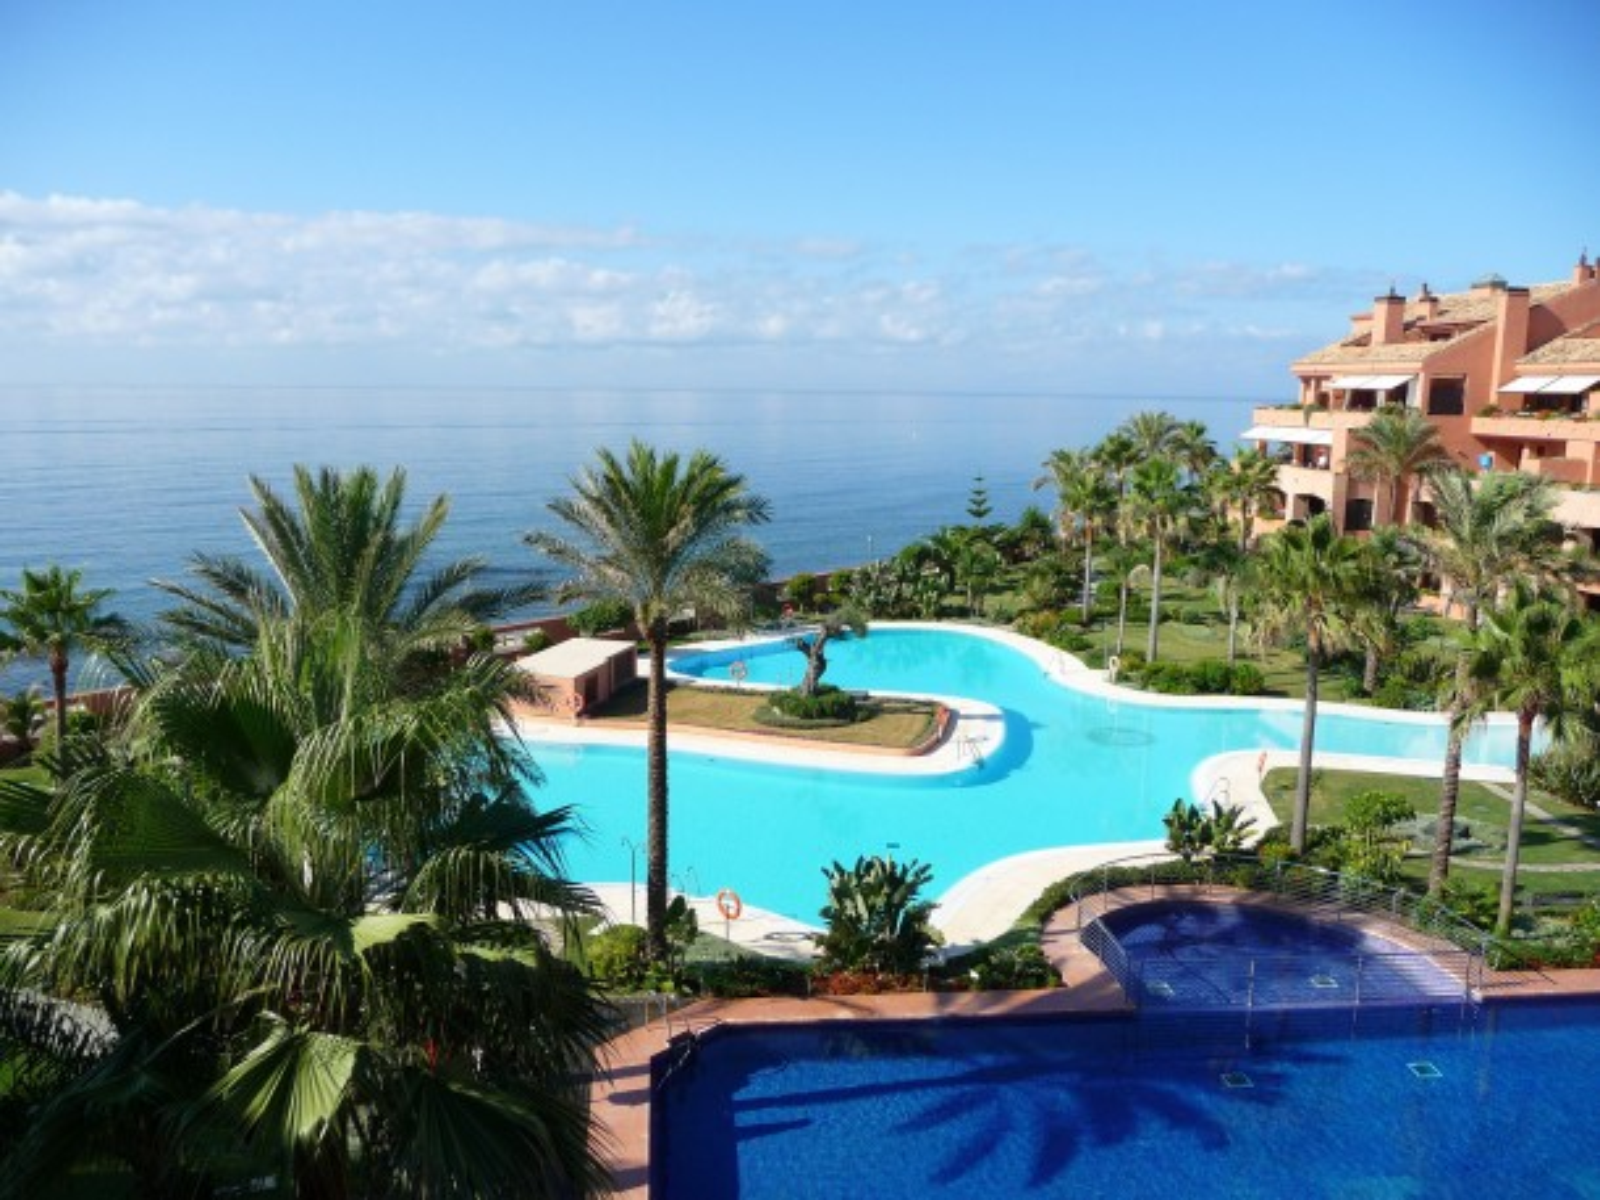 Beachside living in Marbella